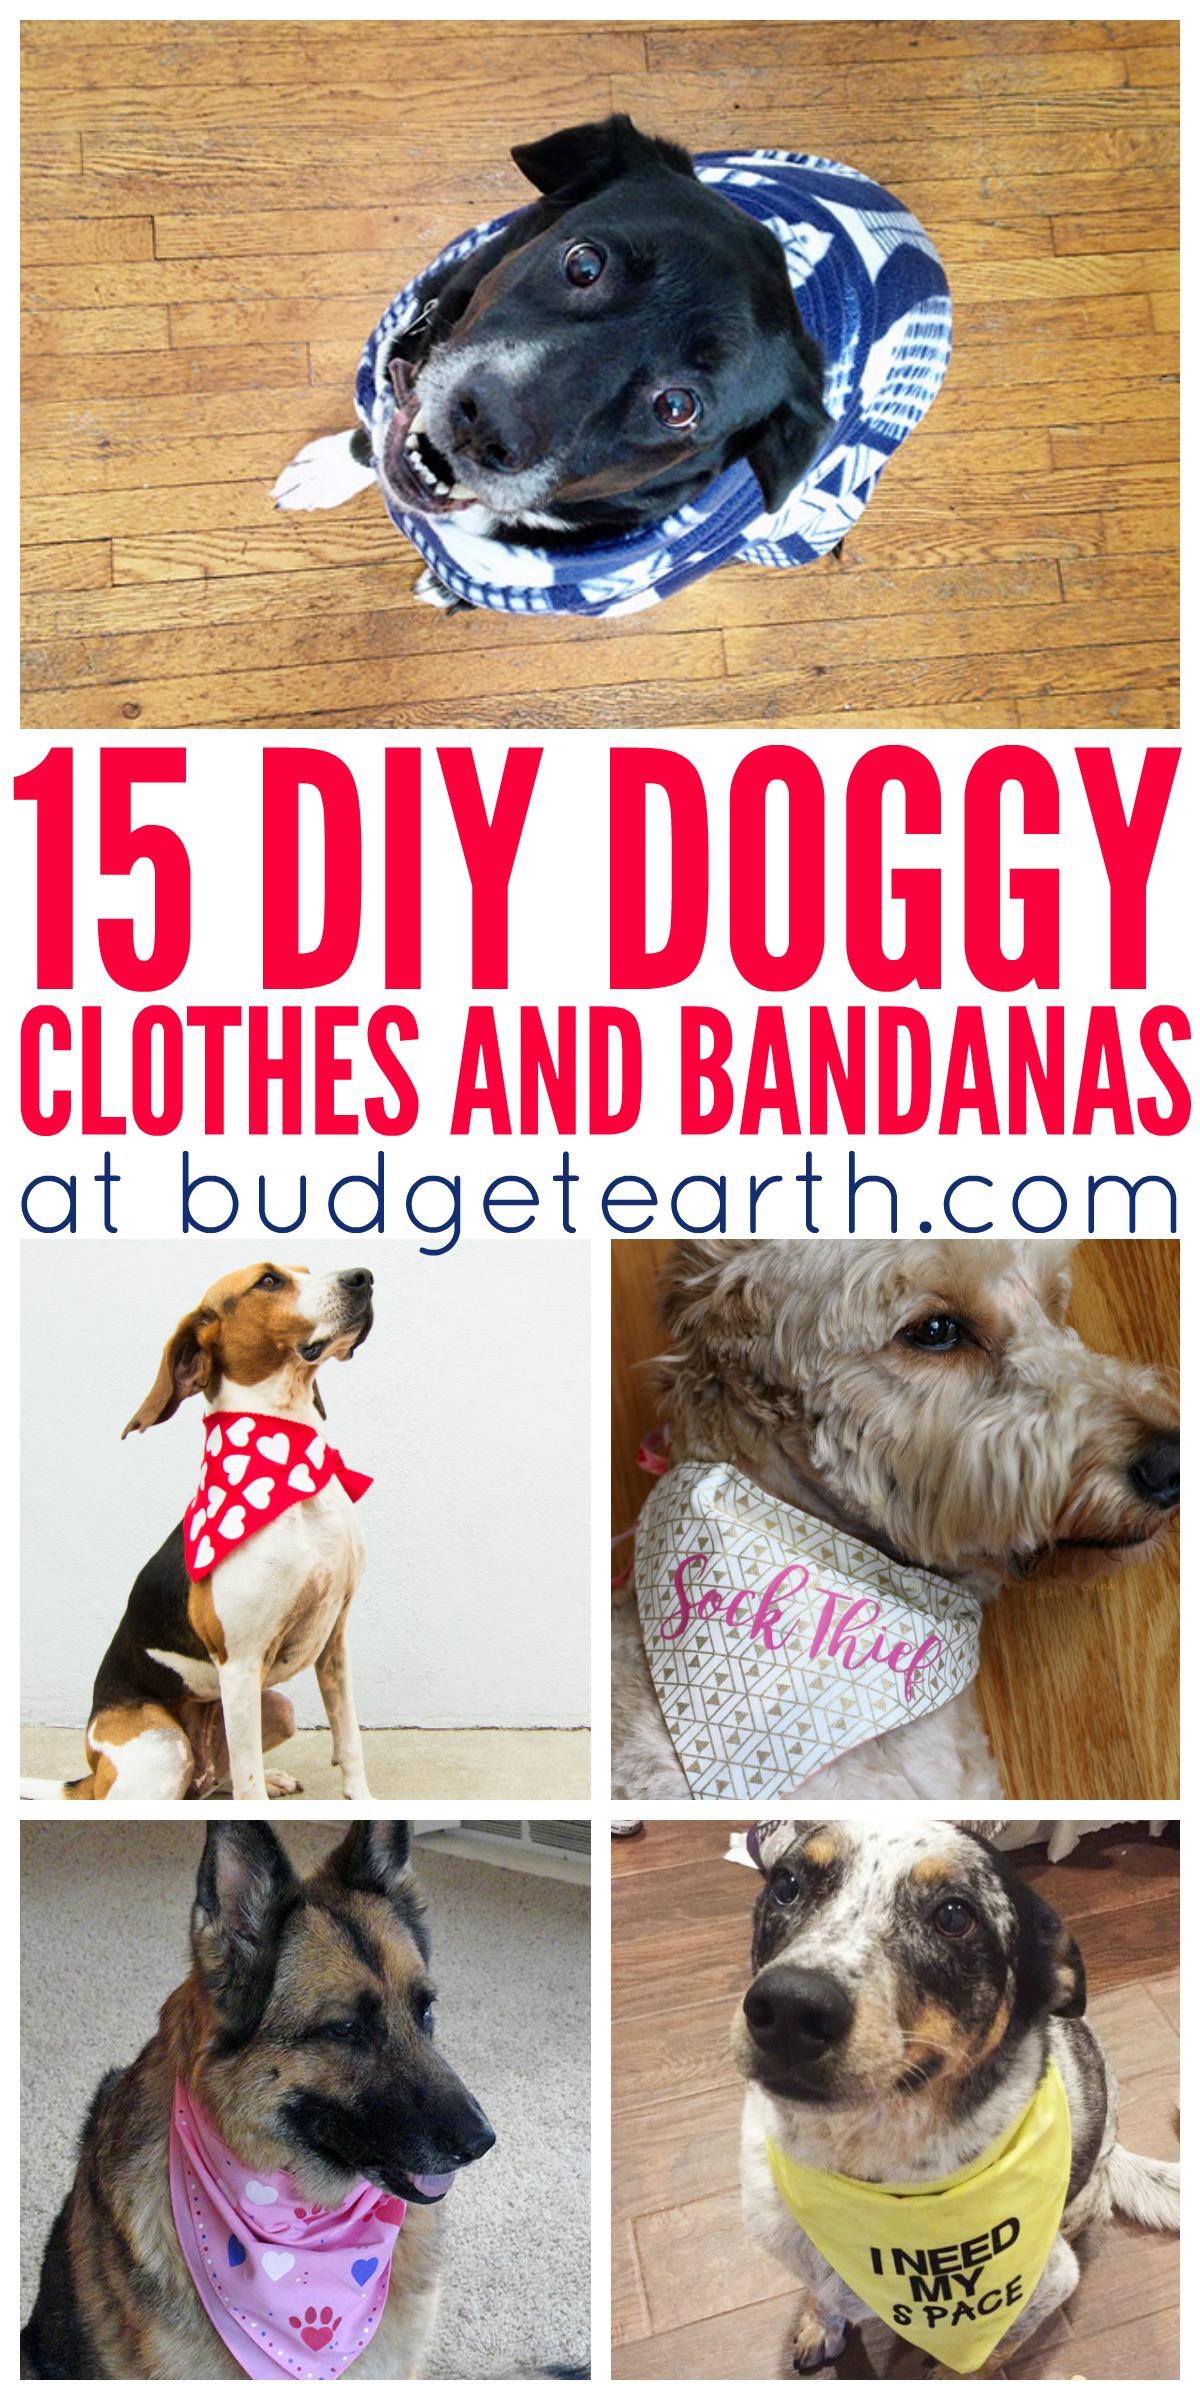 DIY Dog Clothes From Baby Clothes  15 DIY Doggy Clothes & Bandanas